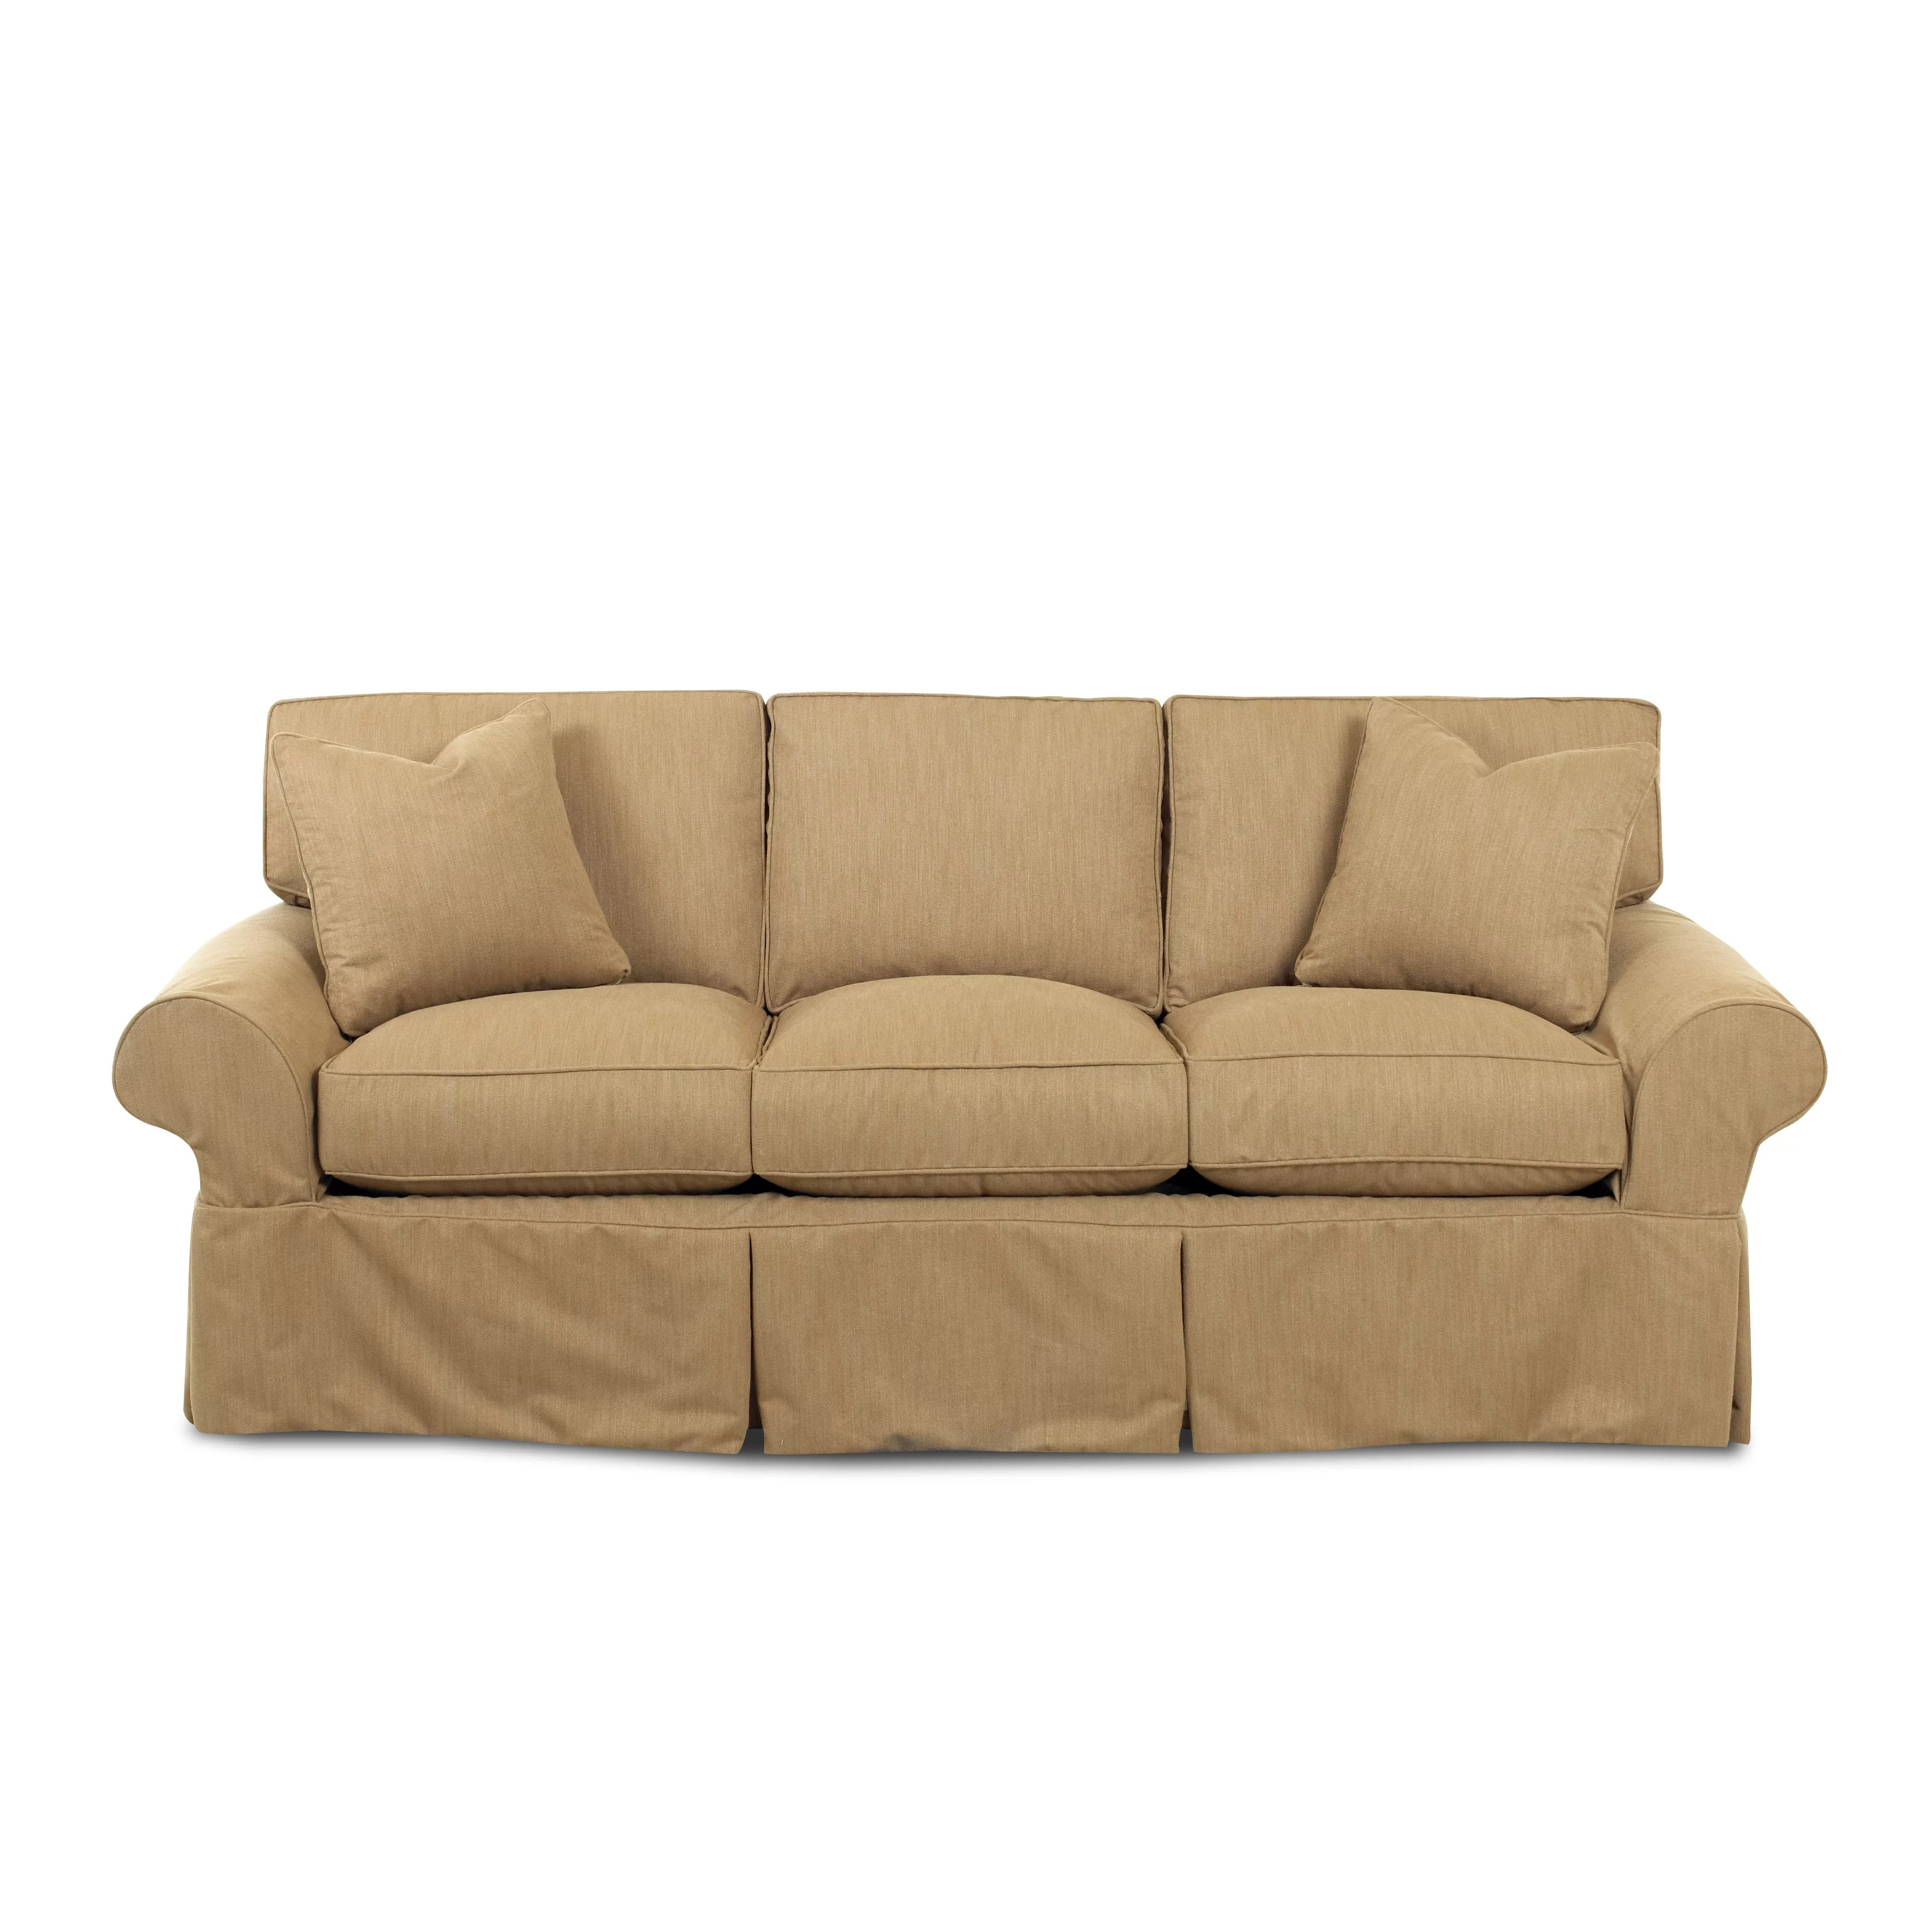 klaussner sofa and loveseat set rooms to go sleepers furniture milton wayfair